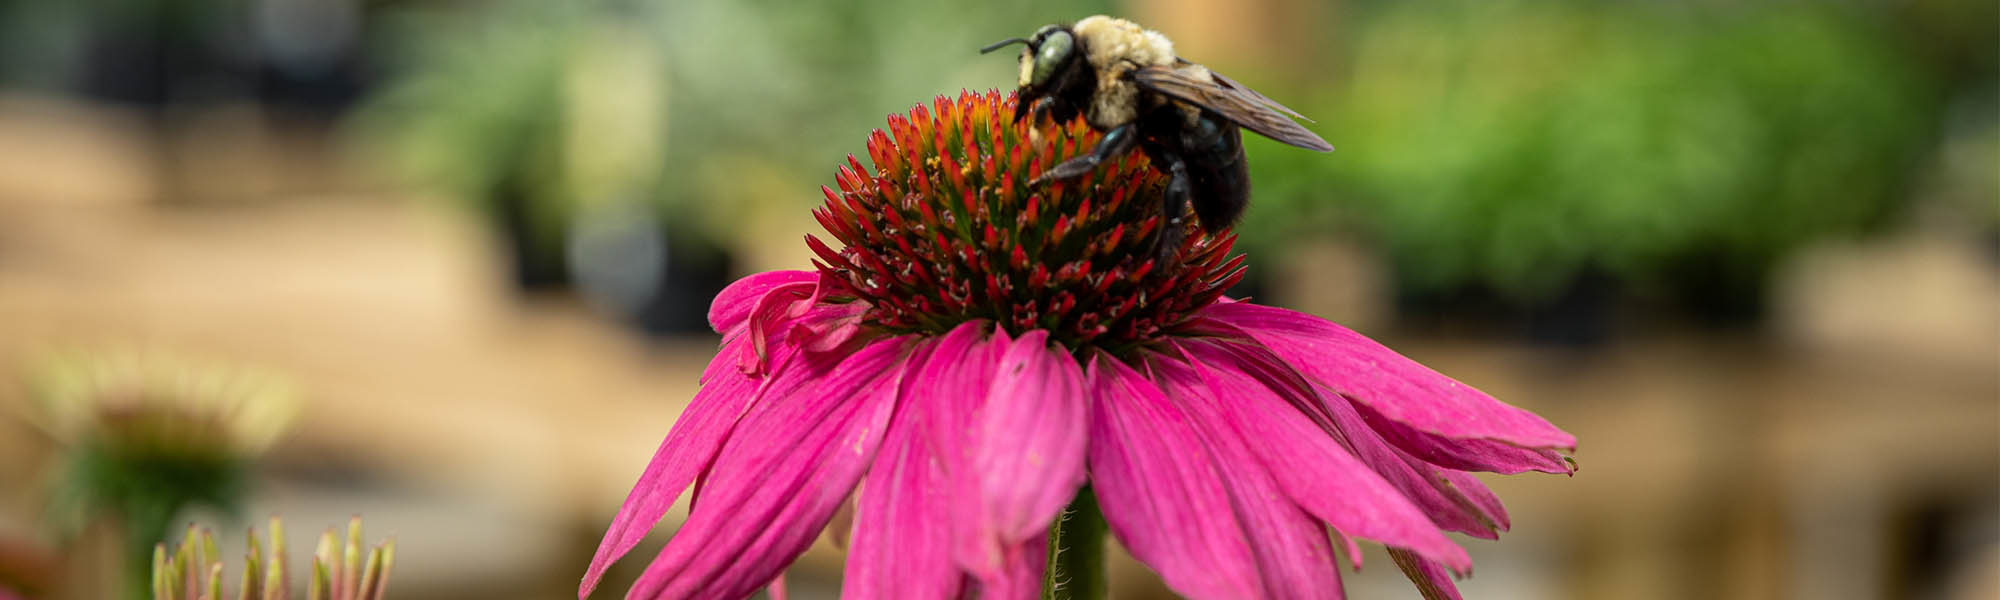 Pollinator friendly plants Nashville